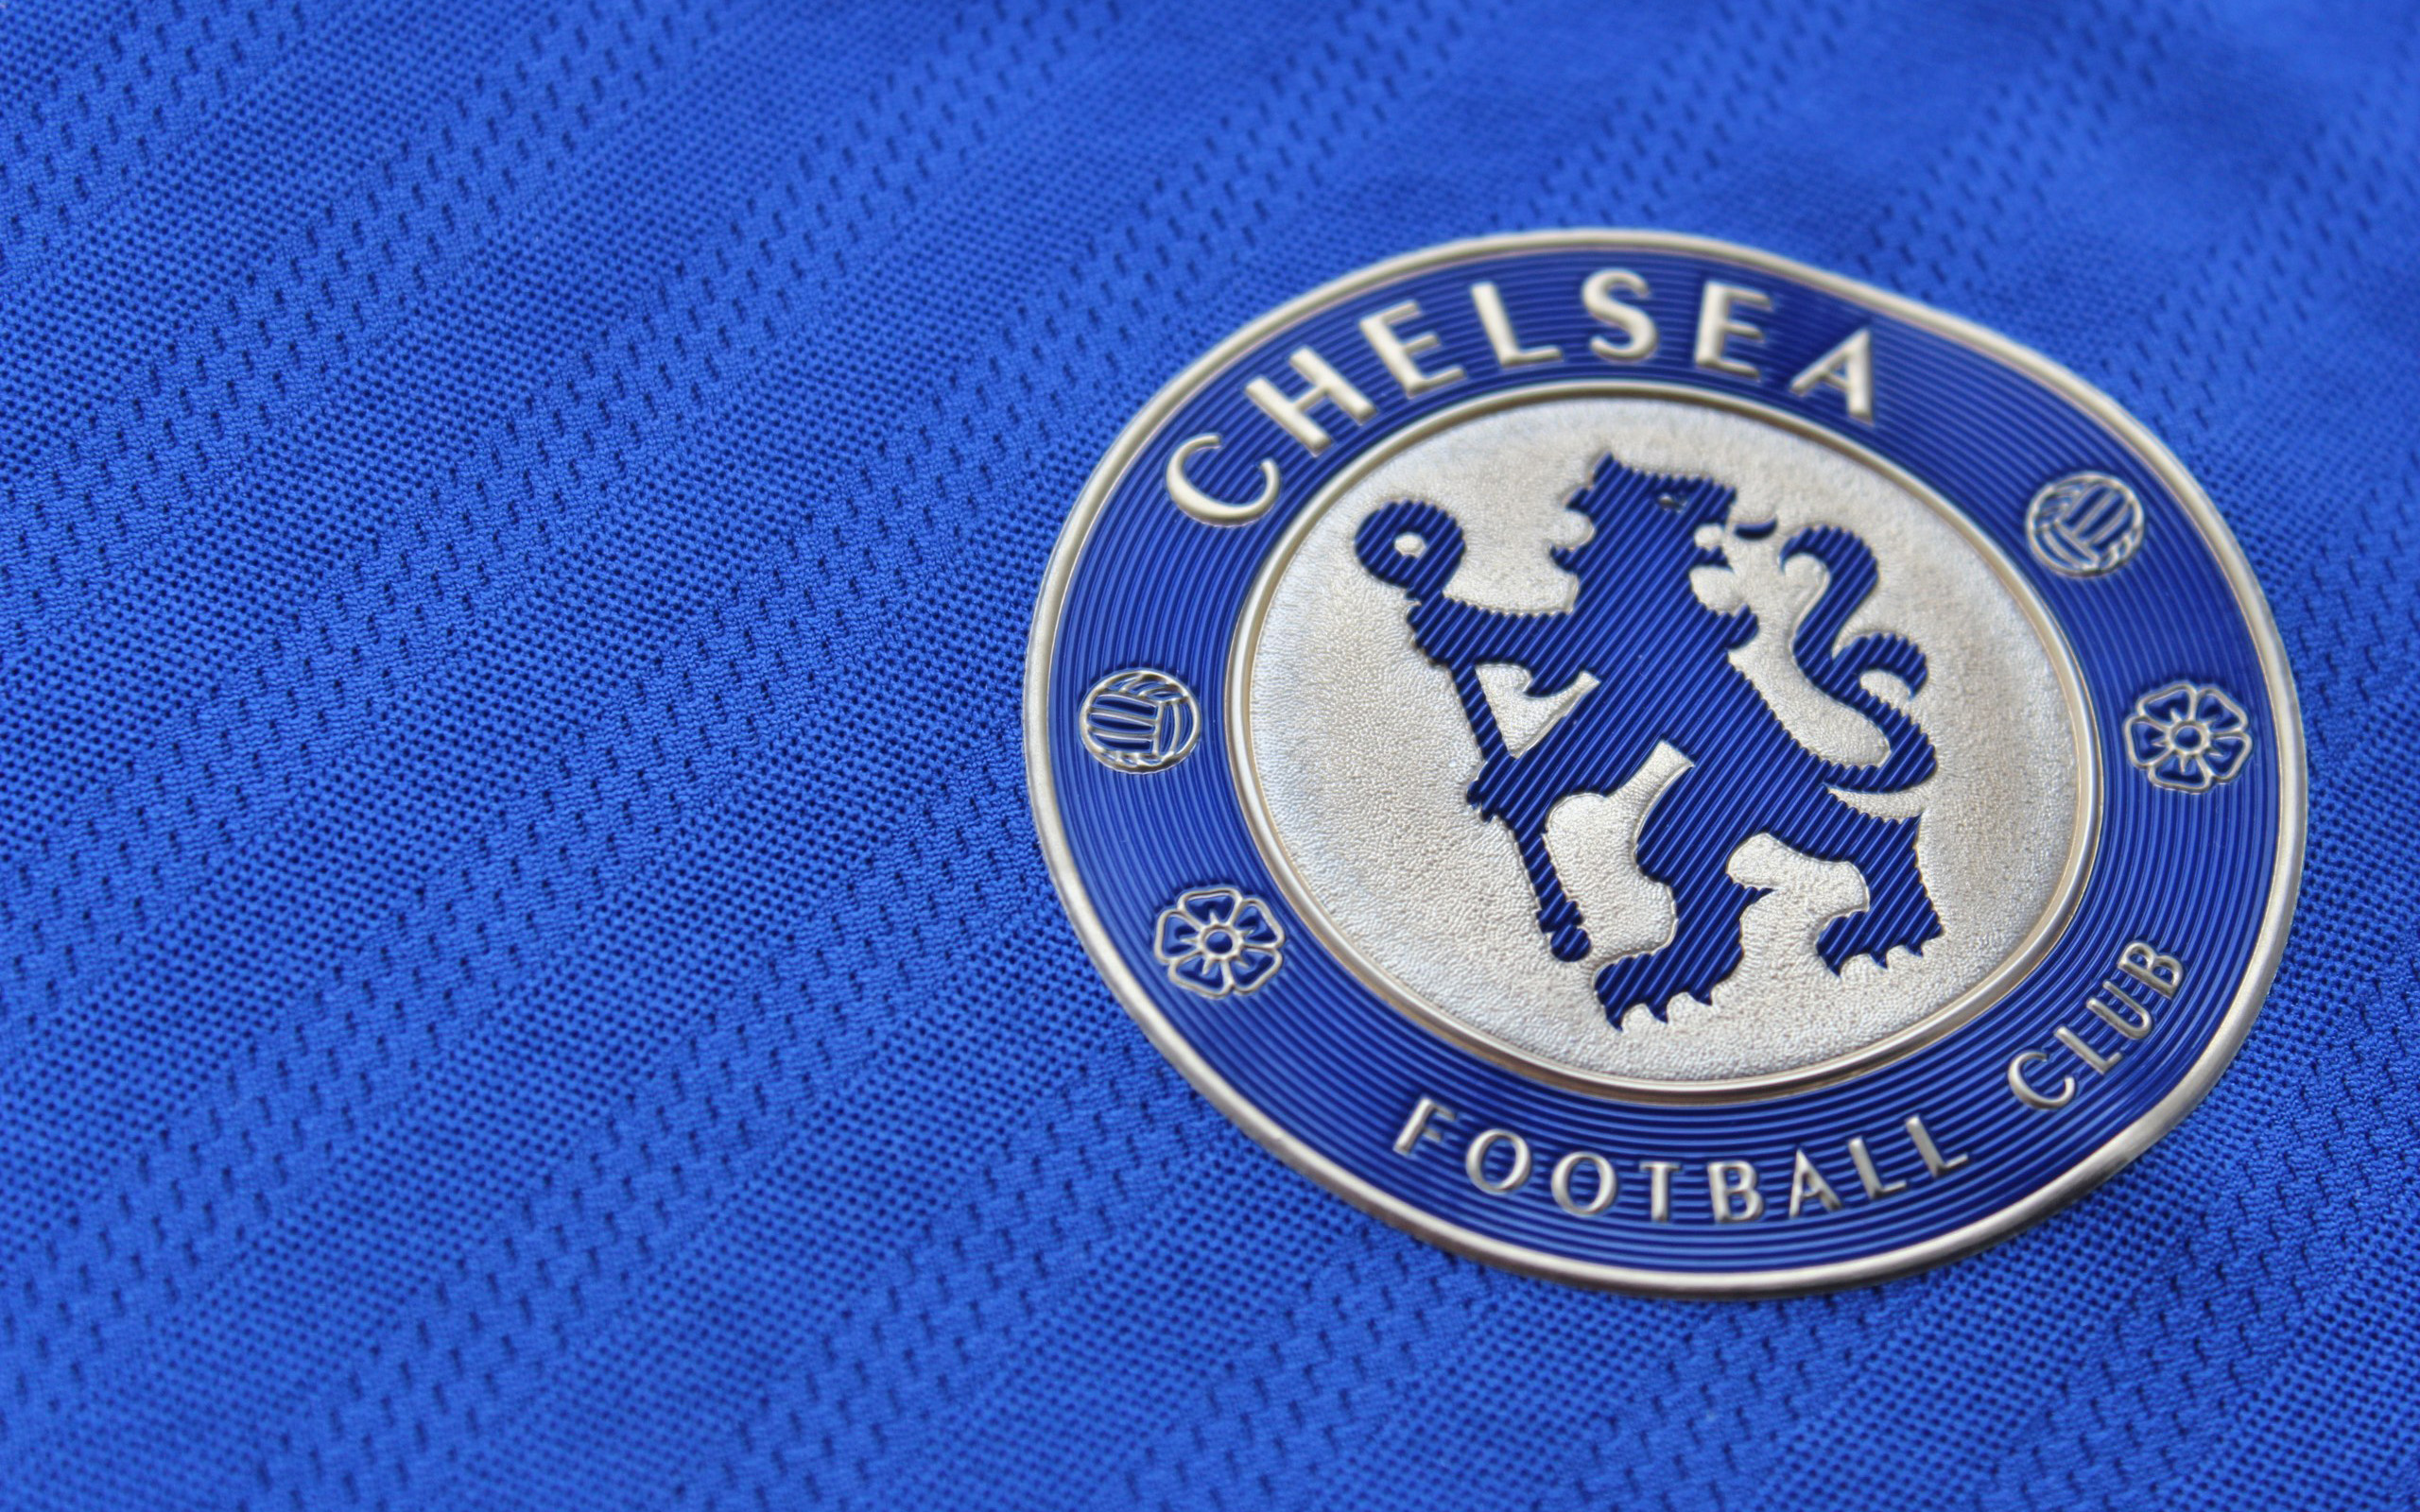 Fondos de pantalla Chelsea Football Club